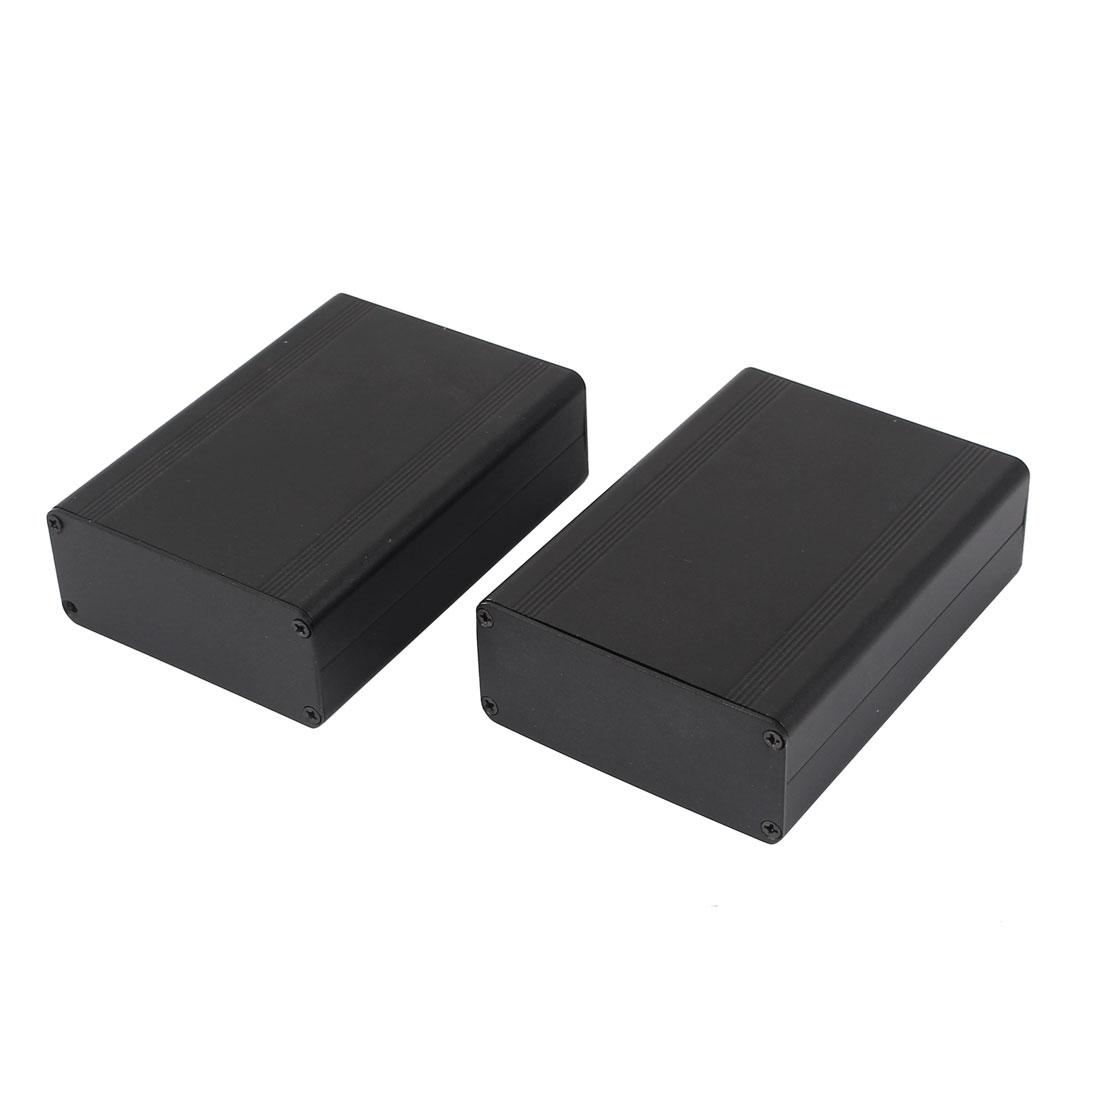 2 Pcs Black Plastic Sealed Electronic Switch Case Junction Box 124mmx88mmx38mm